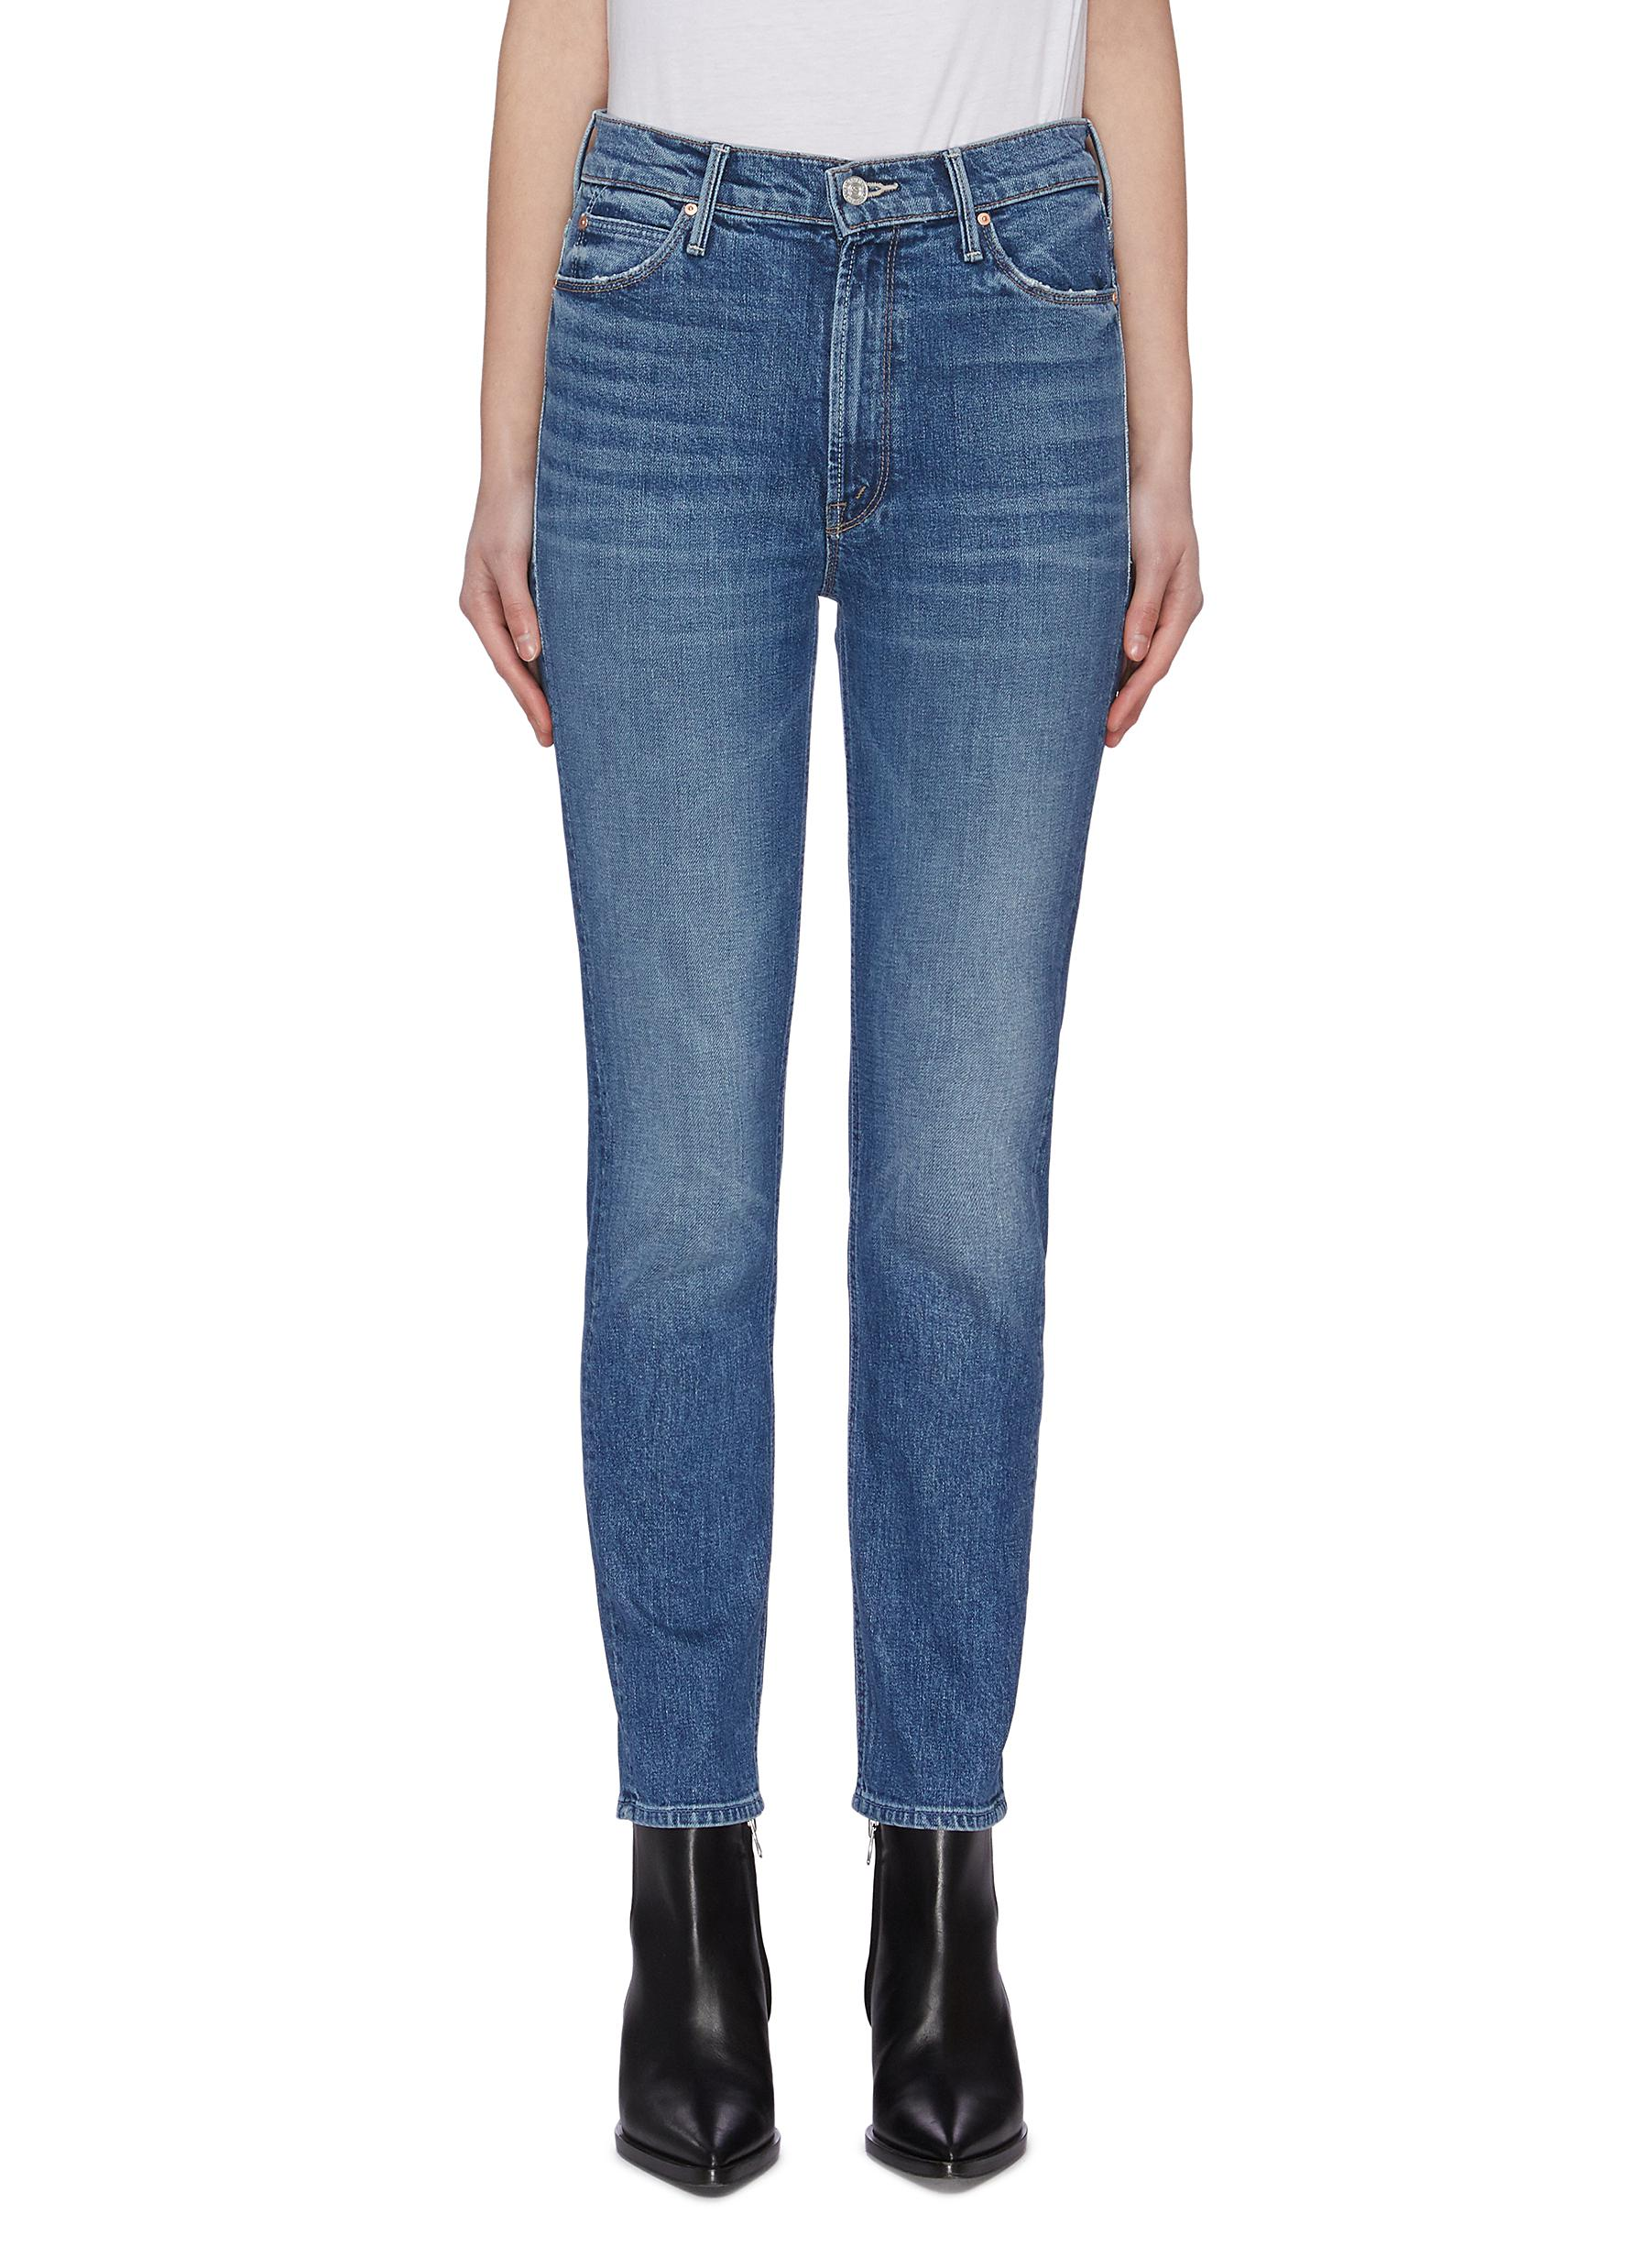 shop Mother 'The Dazzler MR' whiskering jeans online